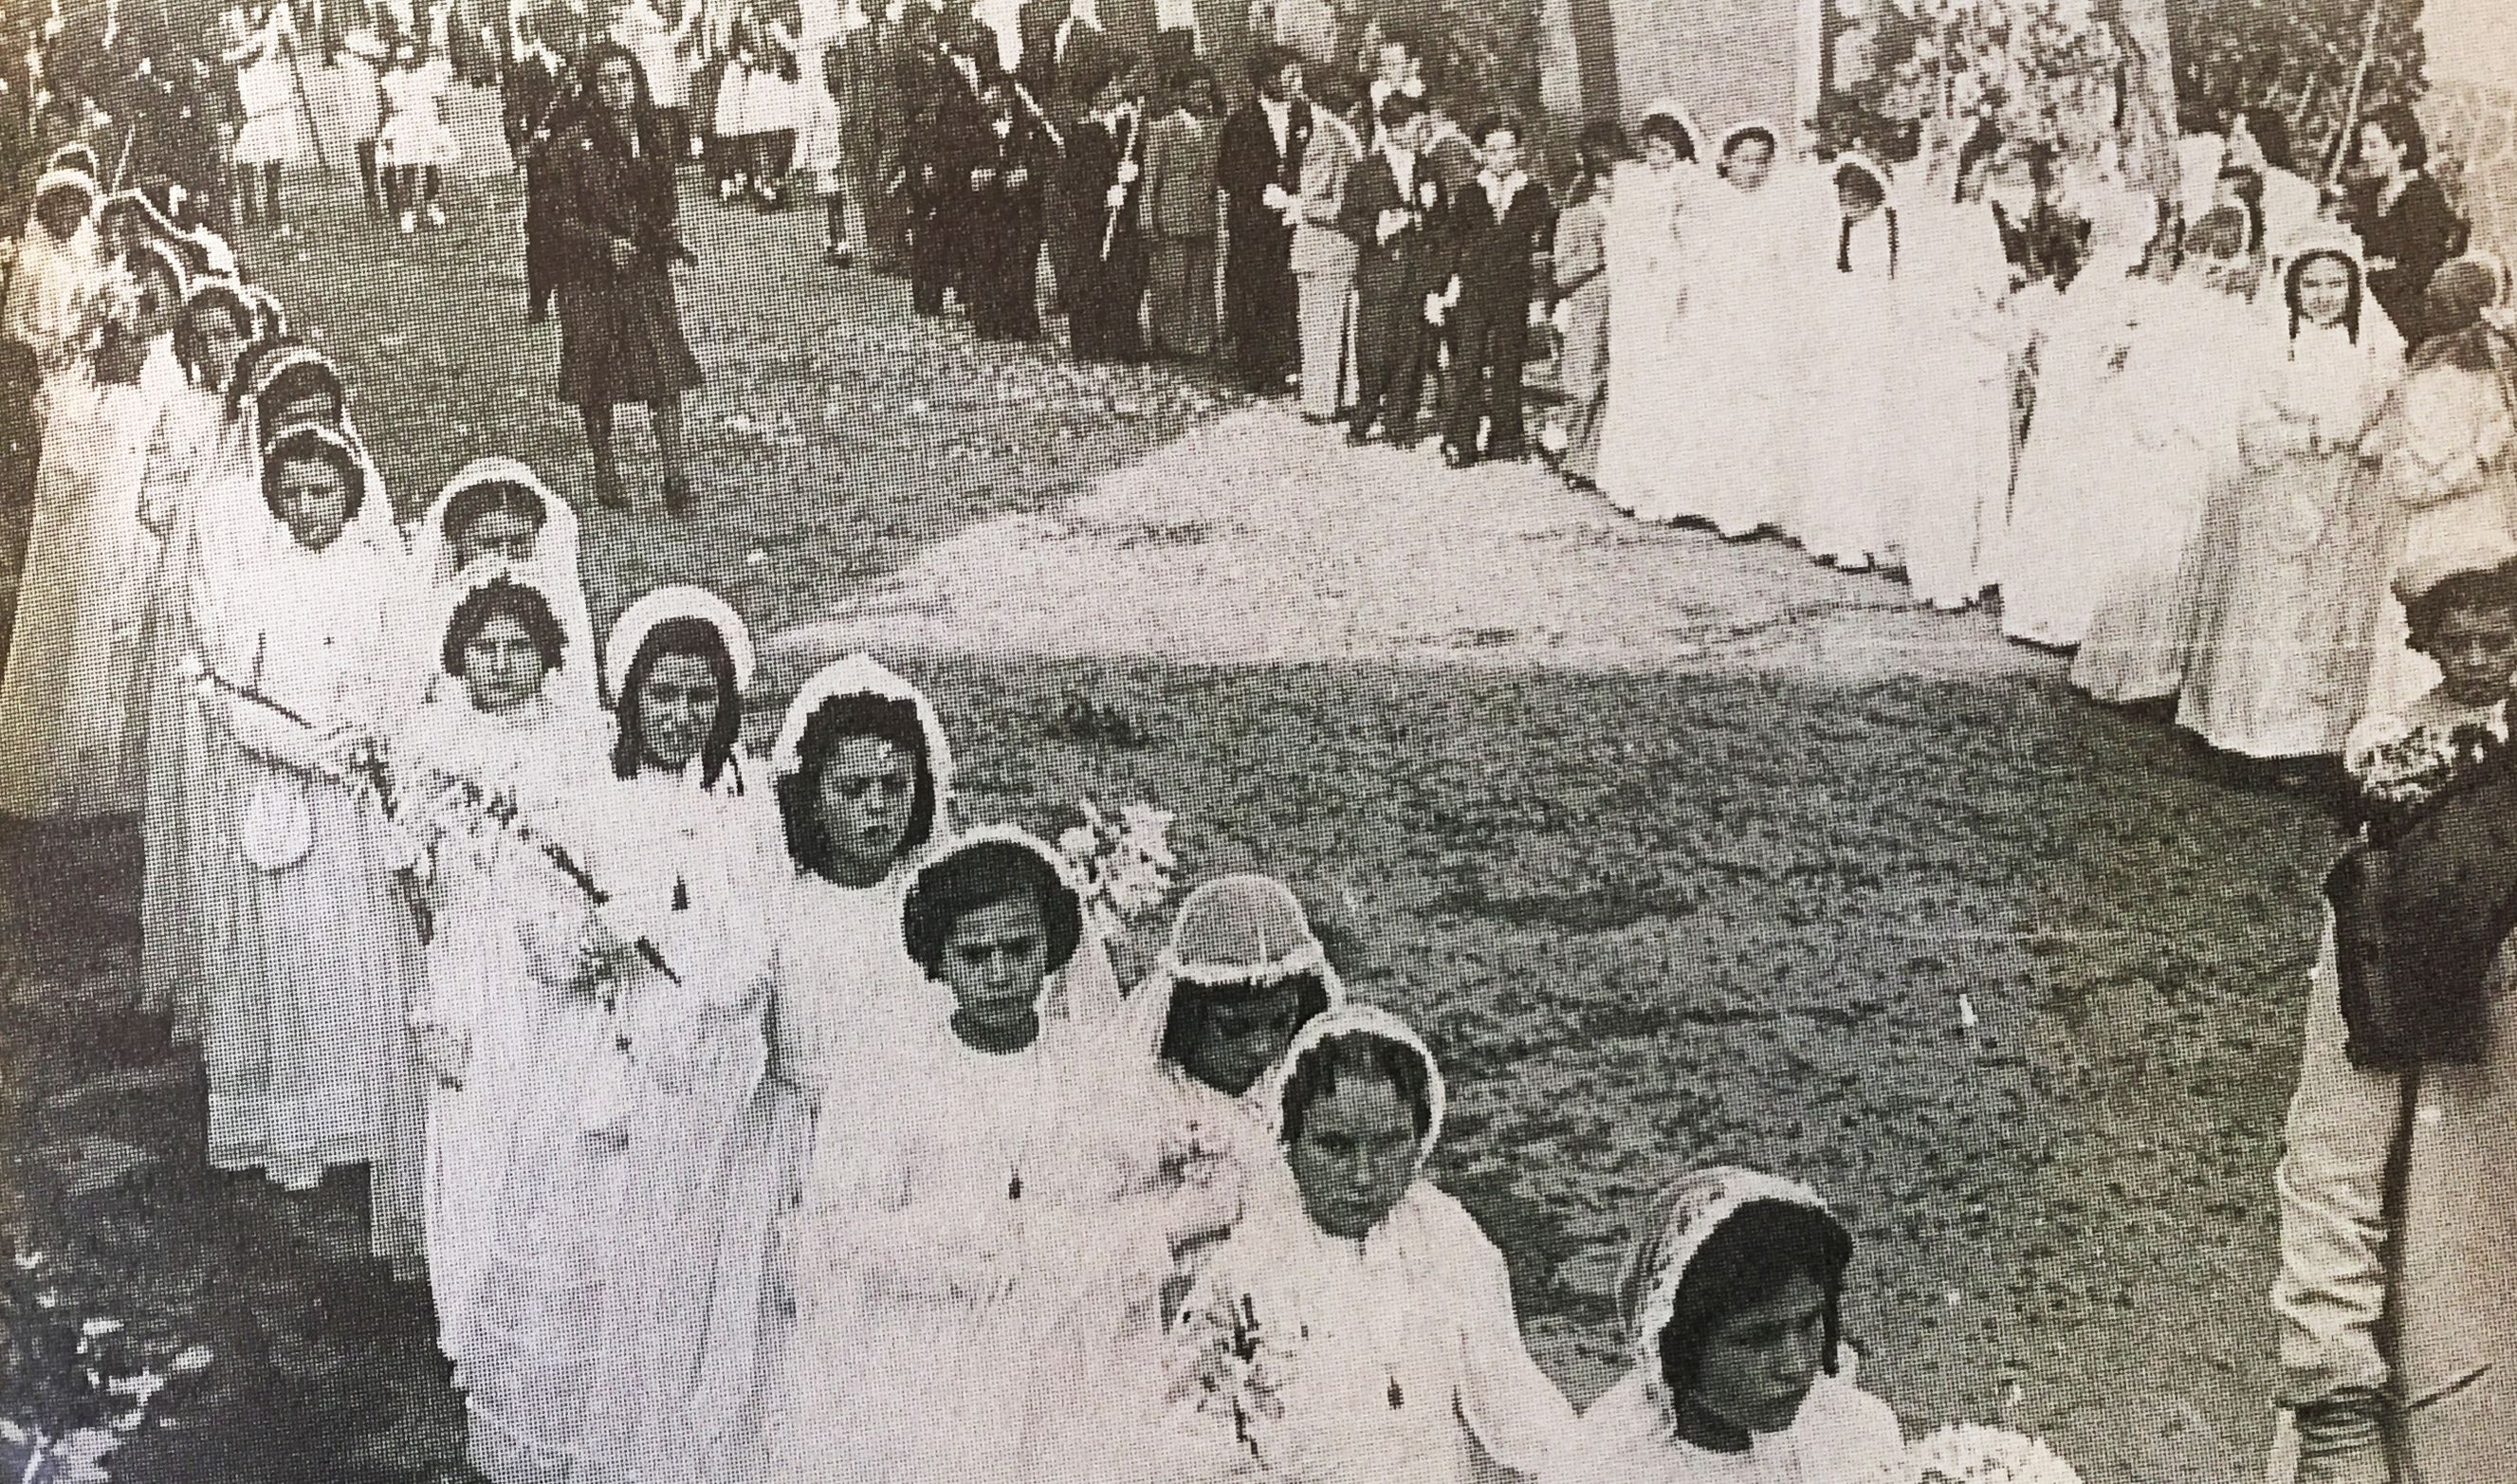 Celebració del Corpus Christi a Cerdanyola. Imatge publicada al TOT Cerdanyola 367